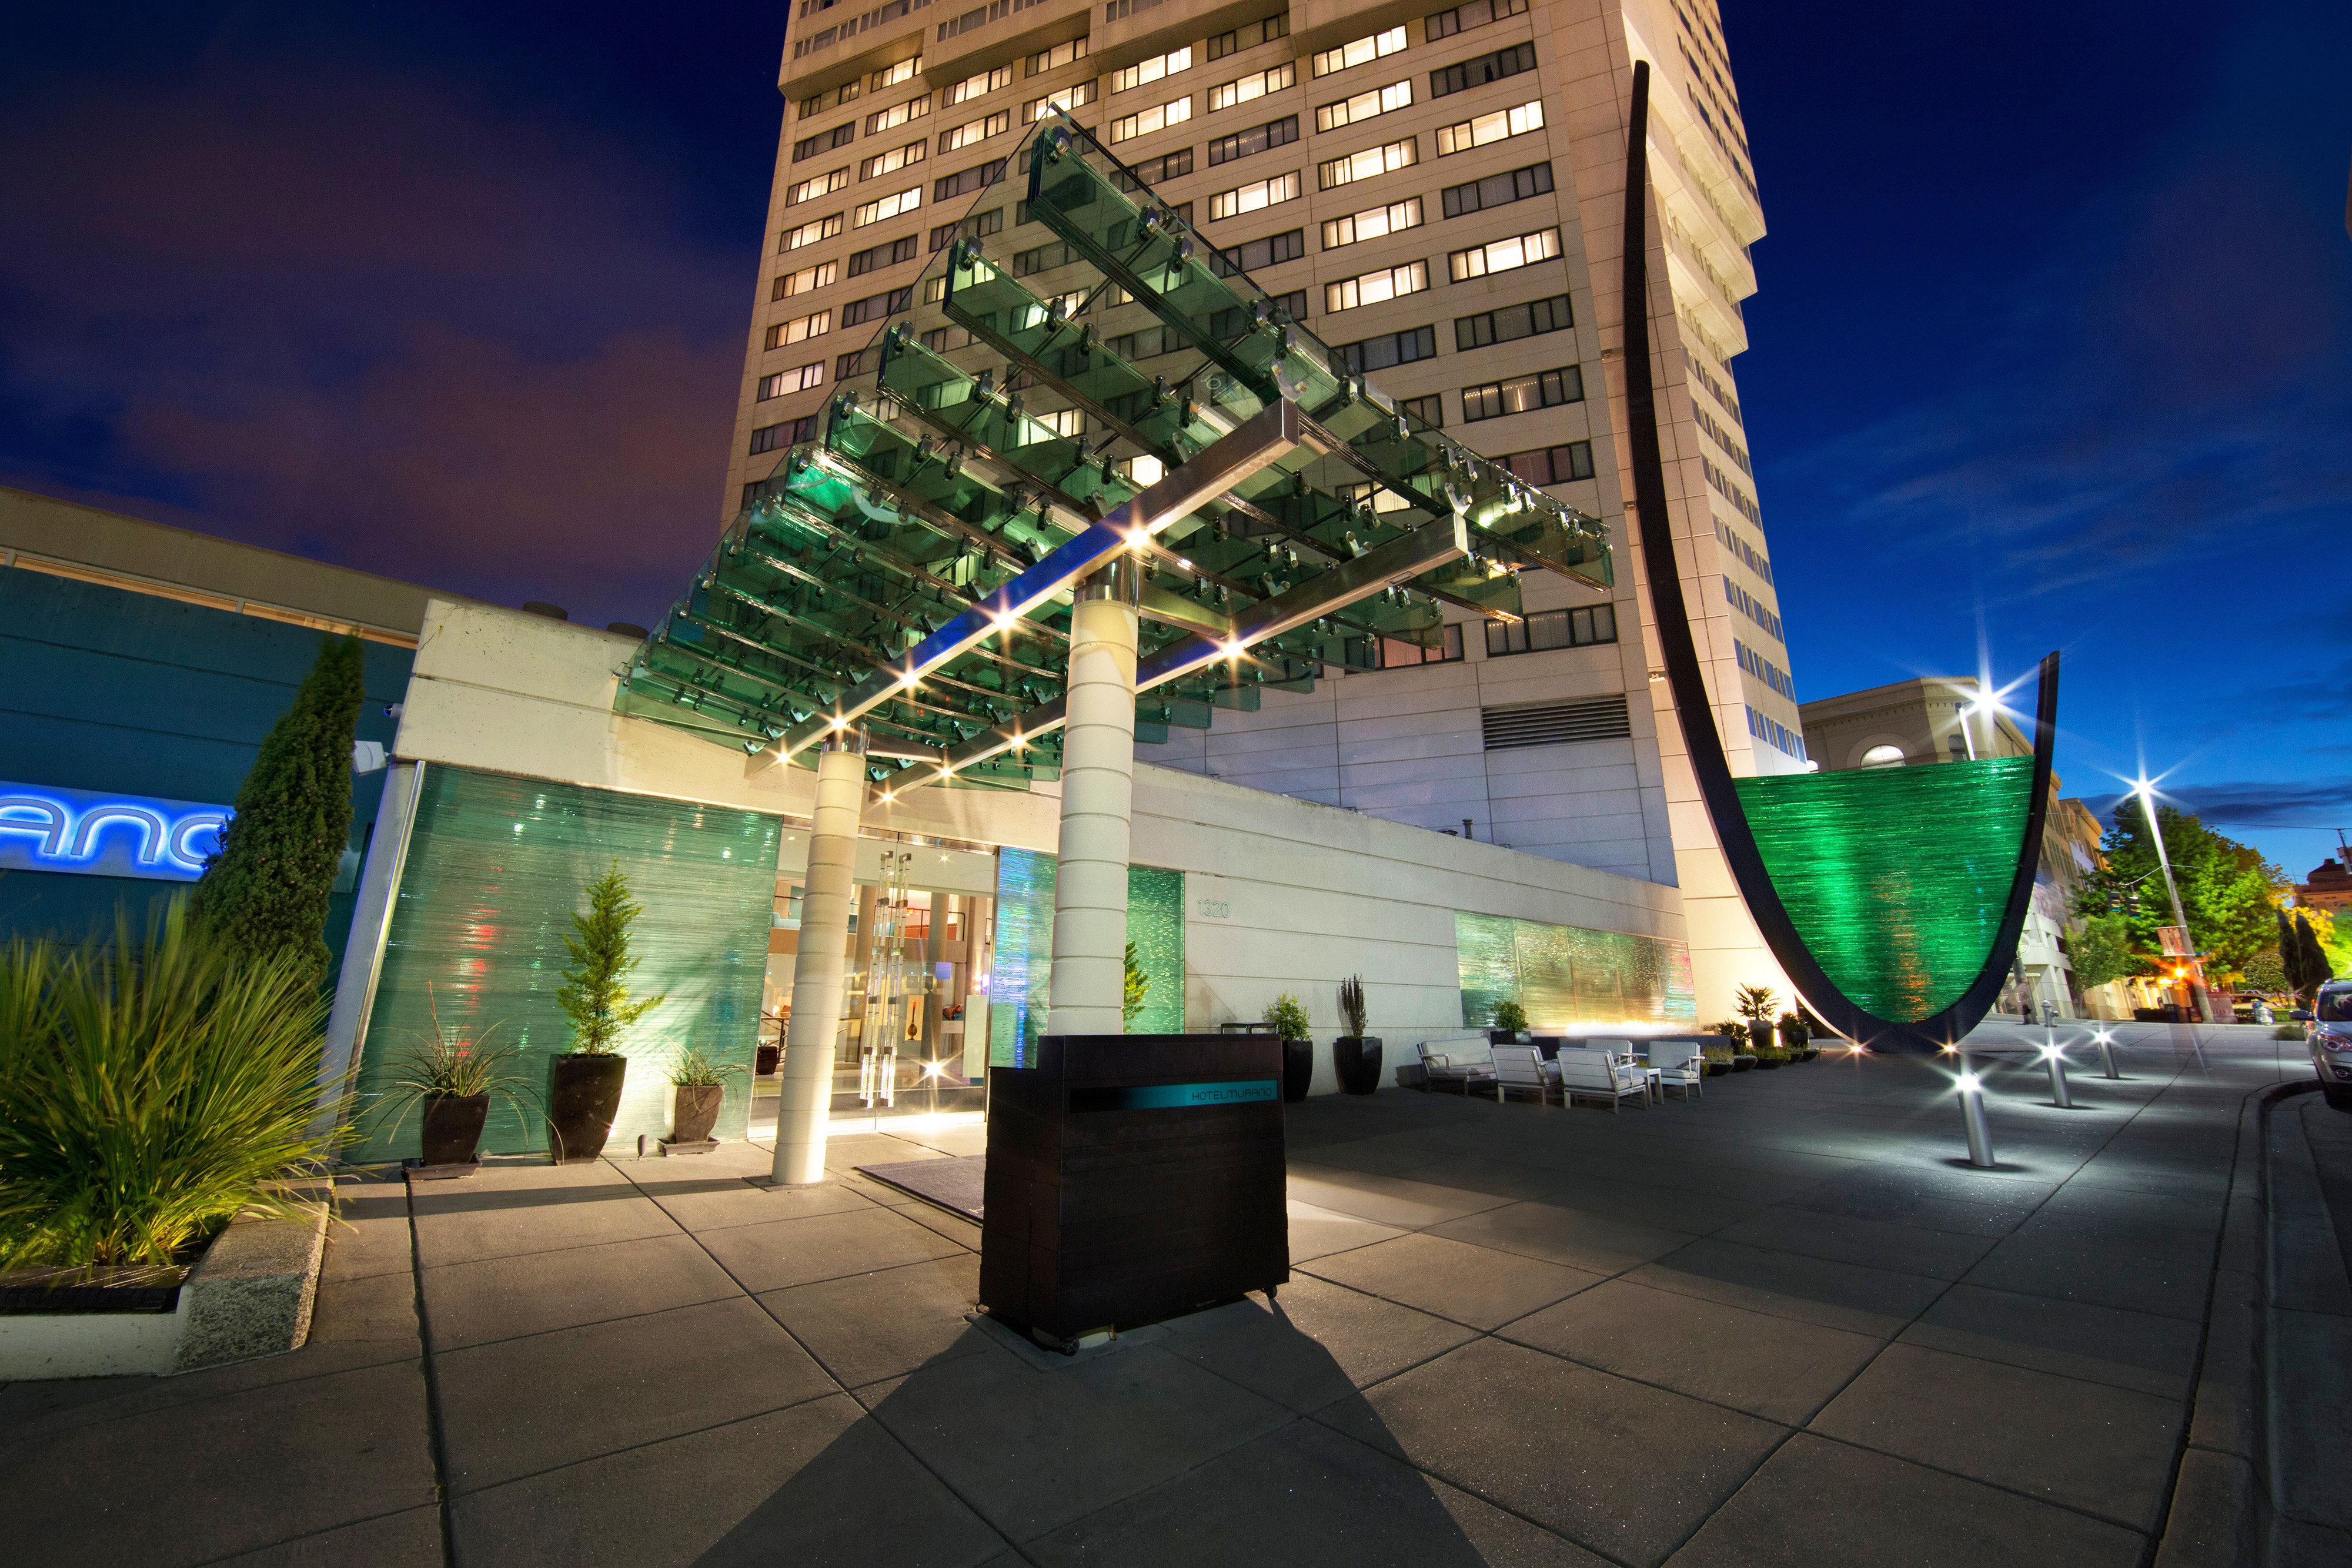 Boutique Budget City Exterior Hip Modern landmark night street Architecture green Downtown shopping mall Resort condominium